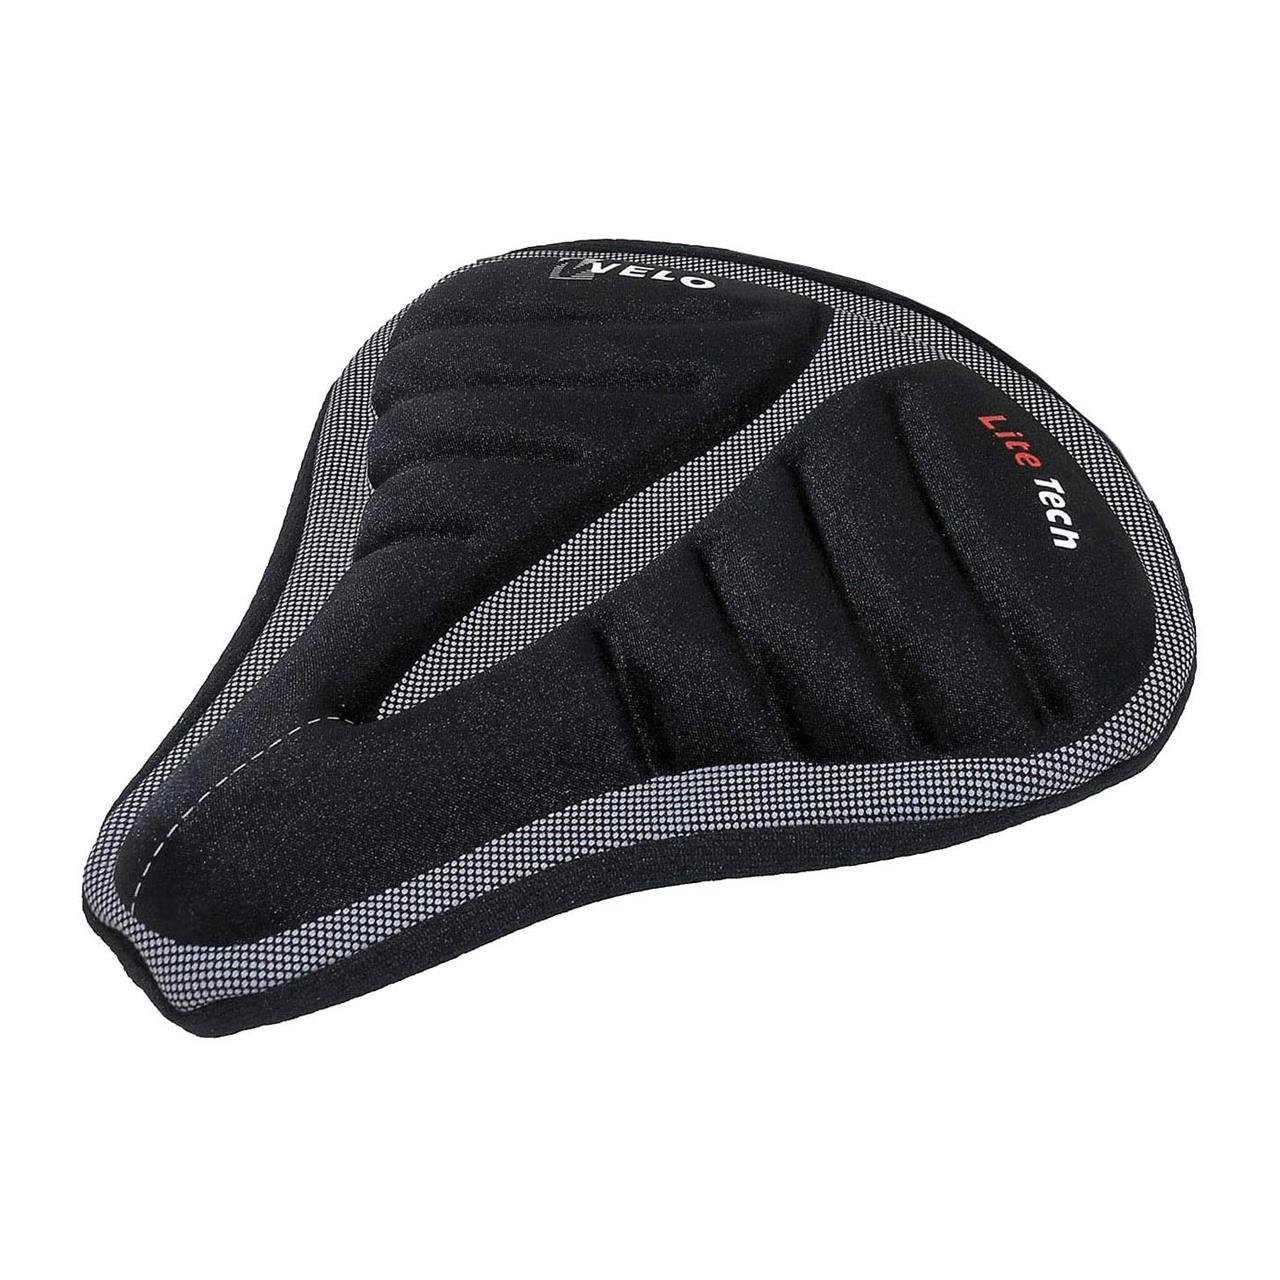 Velo Lite Tech Saddle Cover (Black)